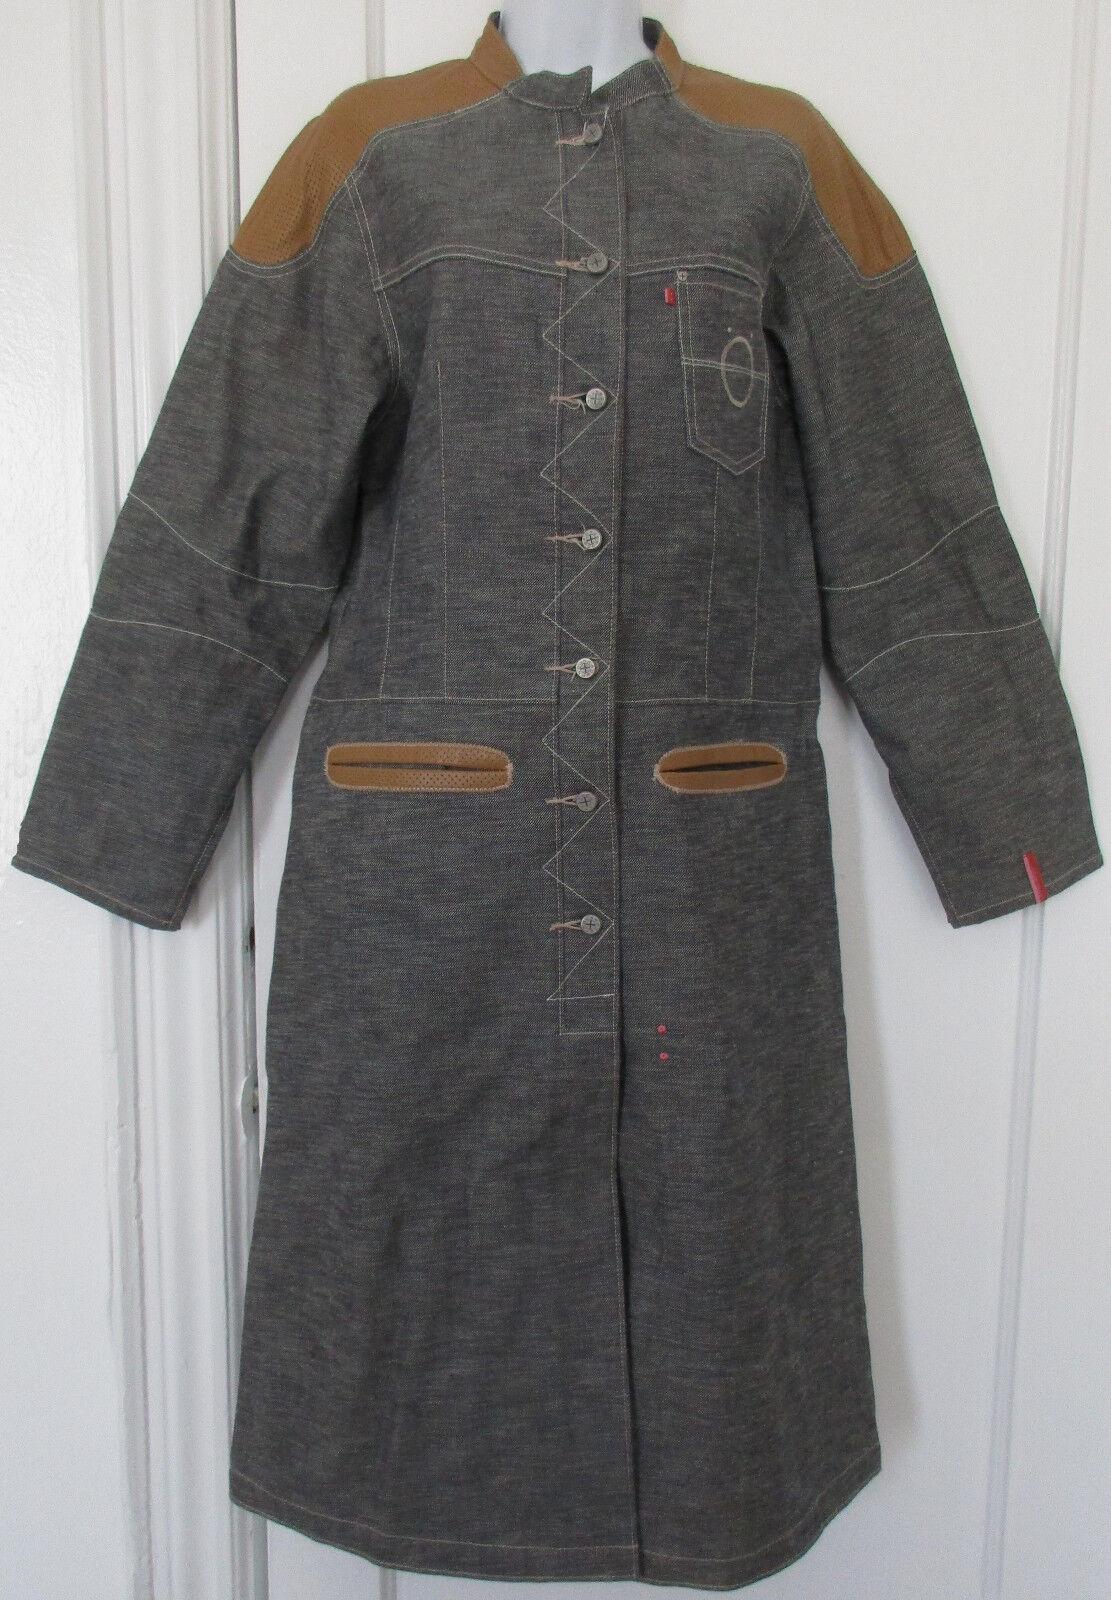 KOPERHAUS Denim Coat Genuine Leather - Worn Twice - Size Large